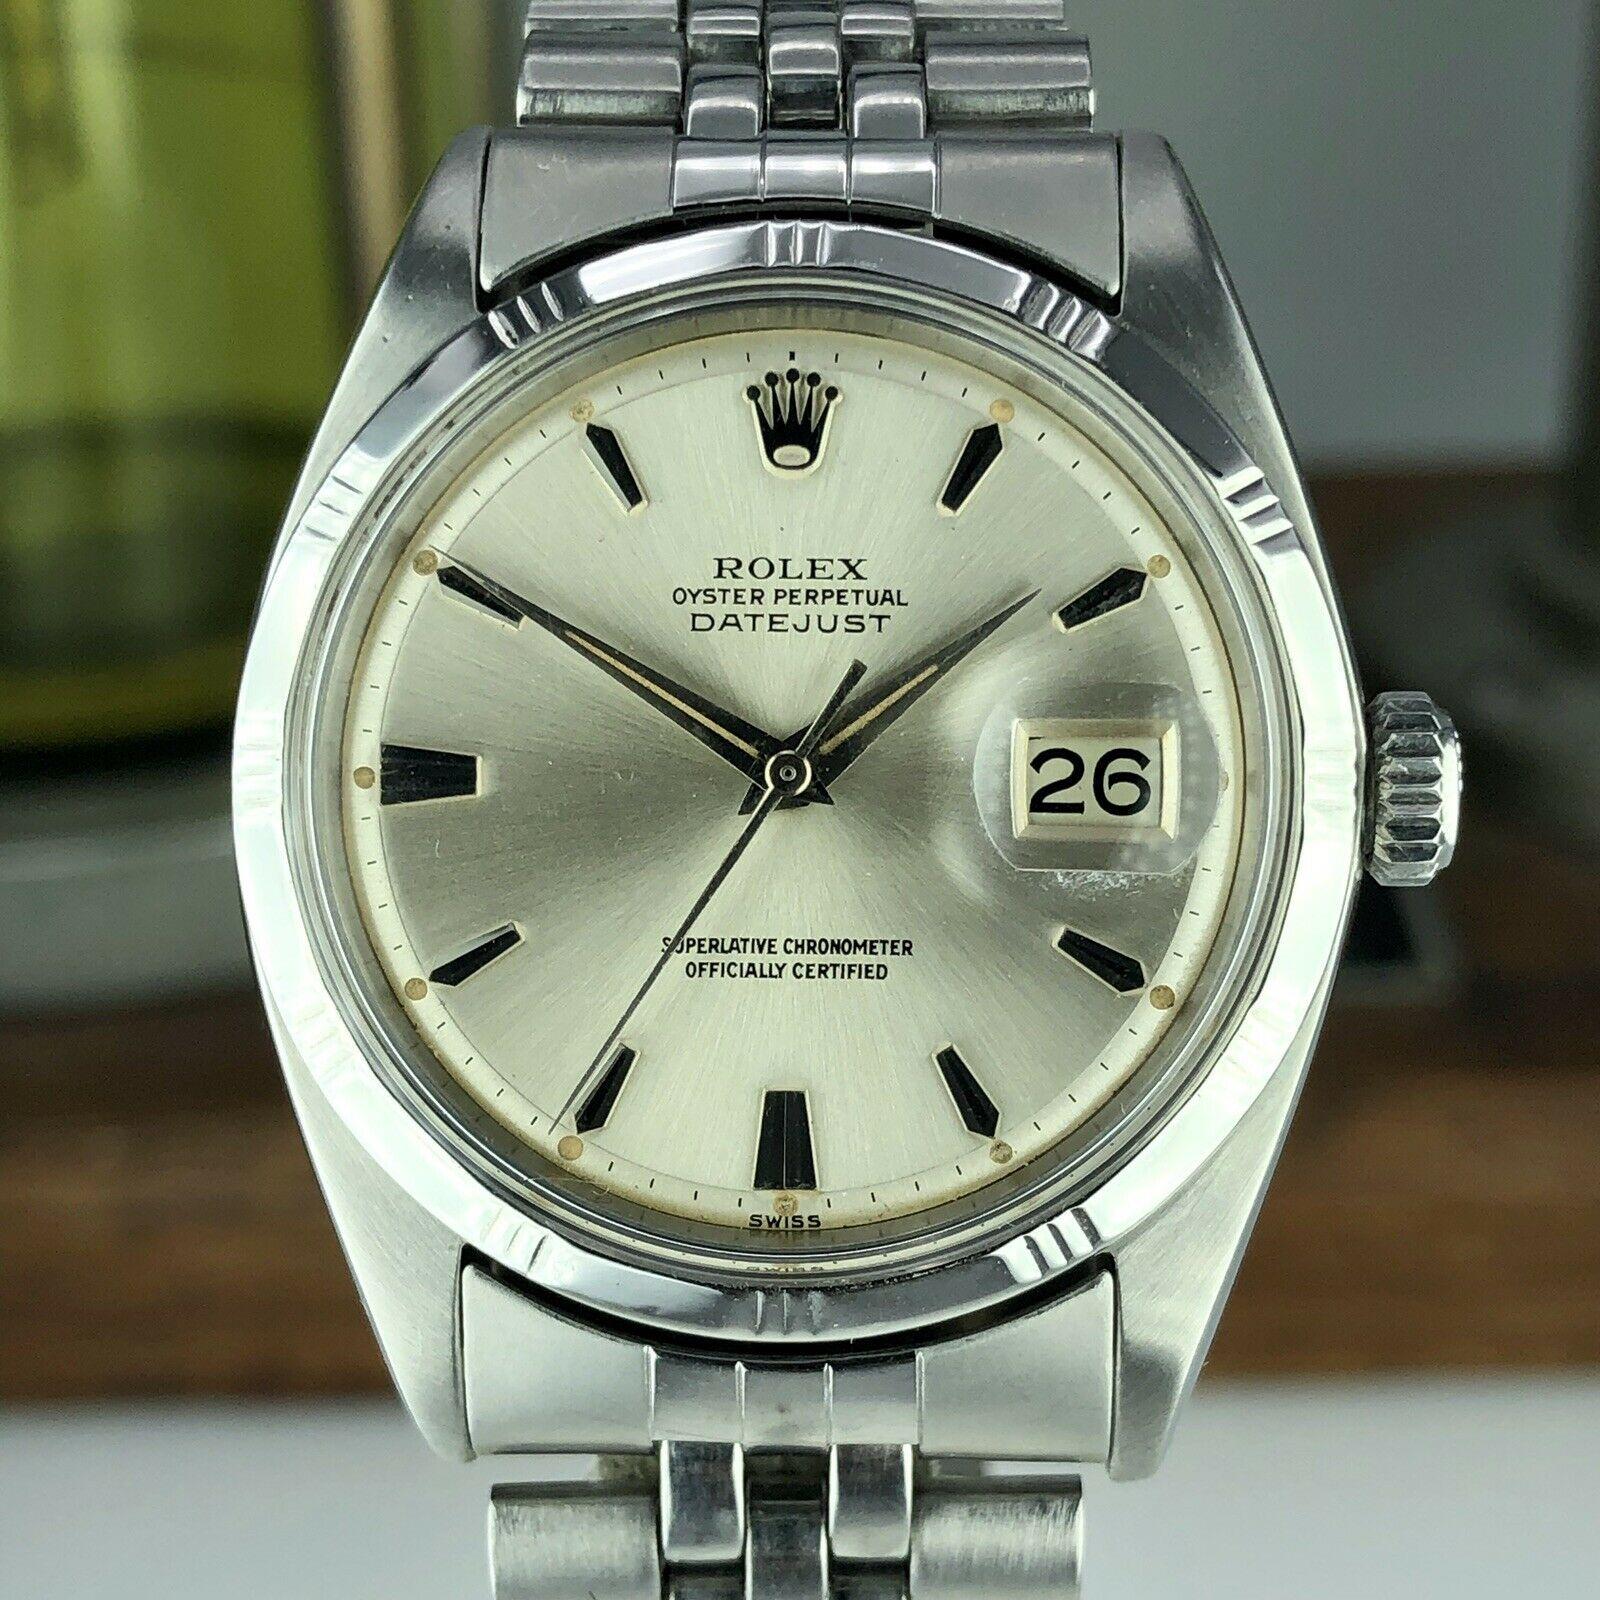 1960 Vintage Rolex Datejust 1603 Radium Dial Bamboo Bezel